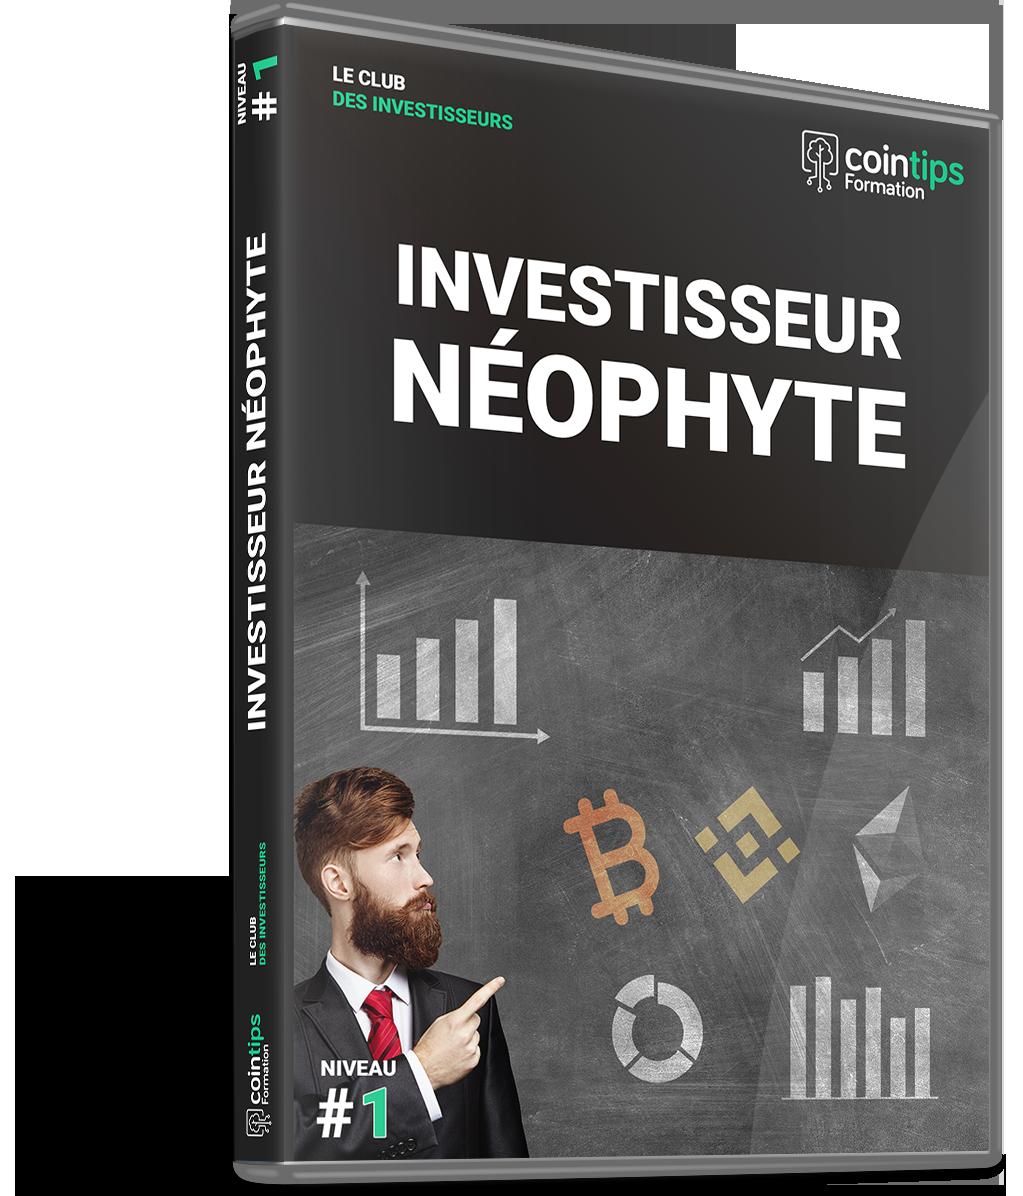 CLUB'INVEST - Investisseur Néophyte